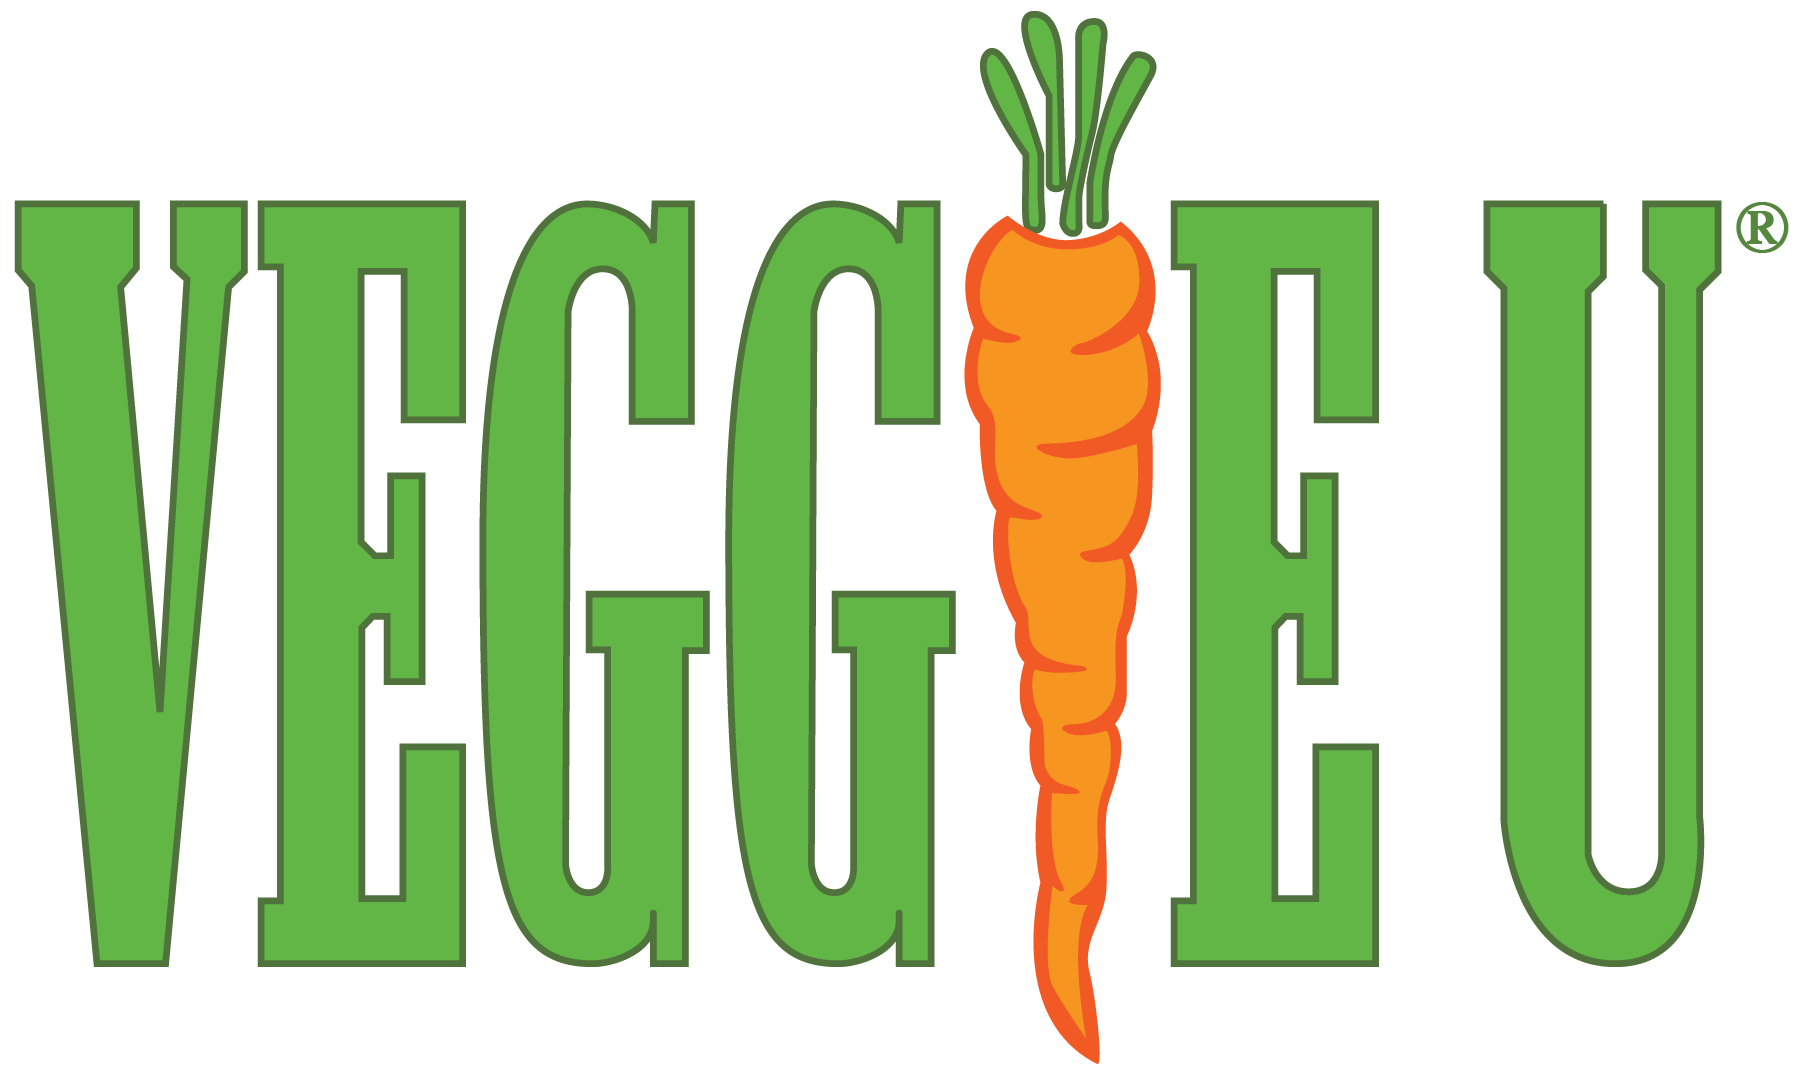 Veggie U logo